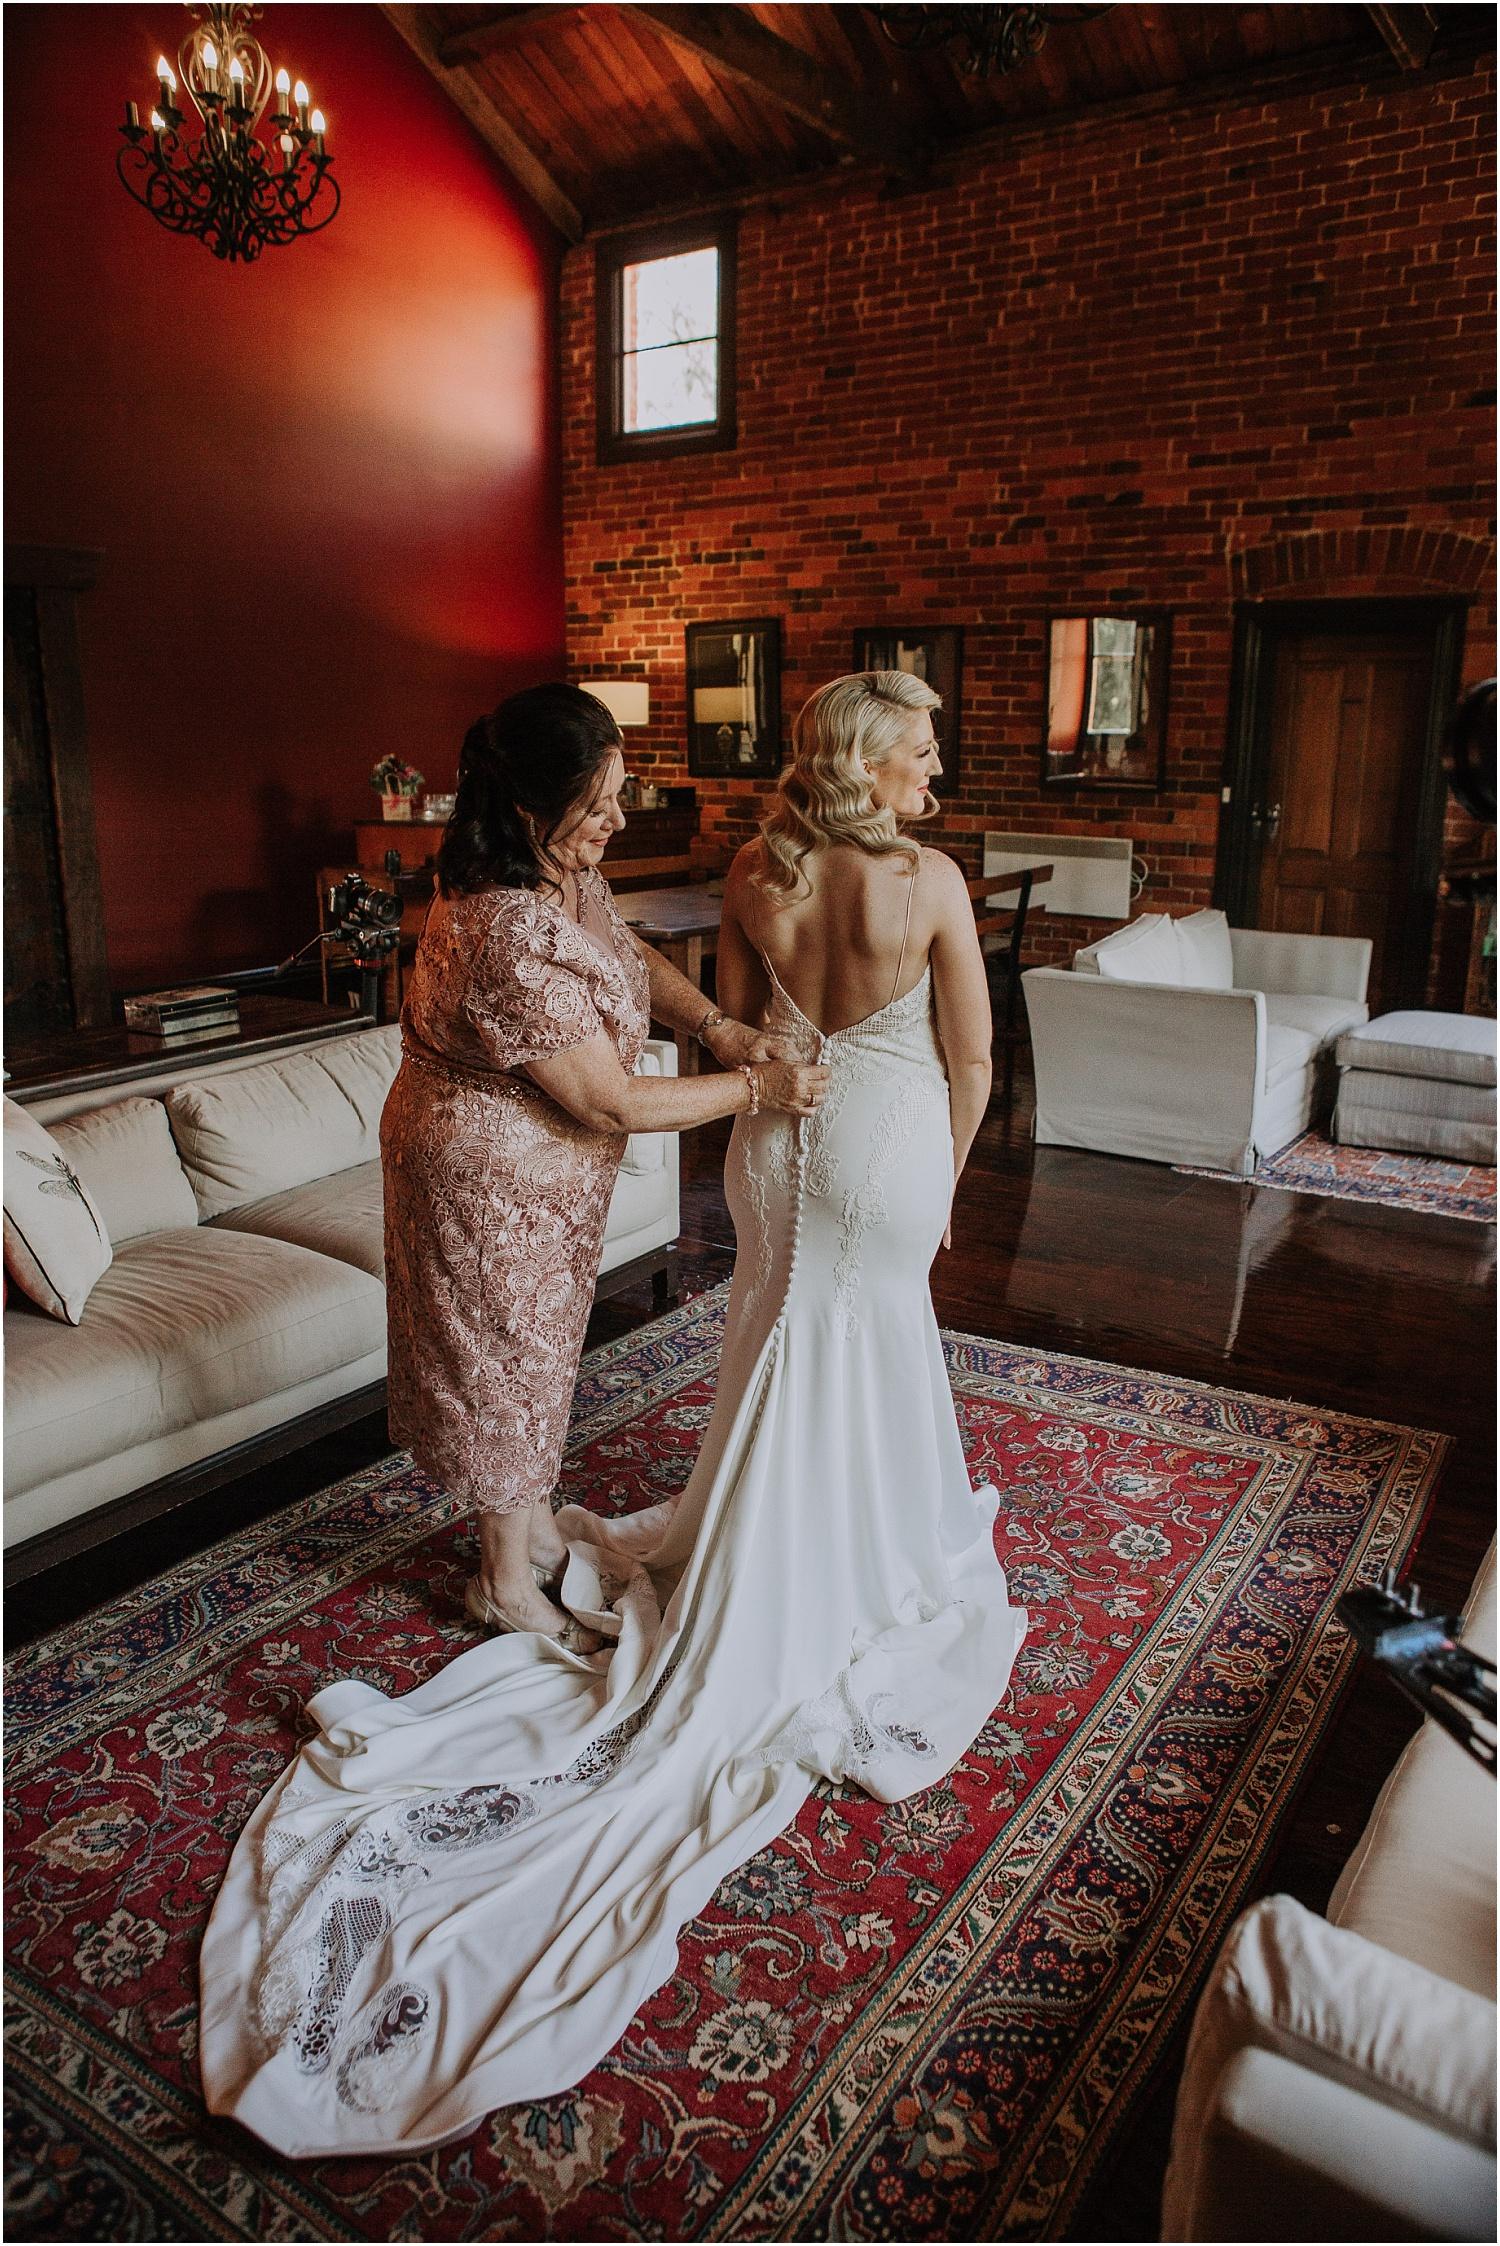 Katherine and Sam's stylish elopment at the Euroa Butter Factory._0024.jpg